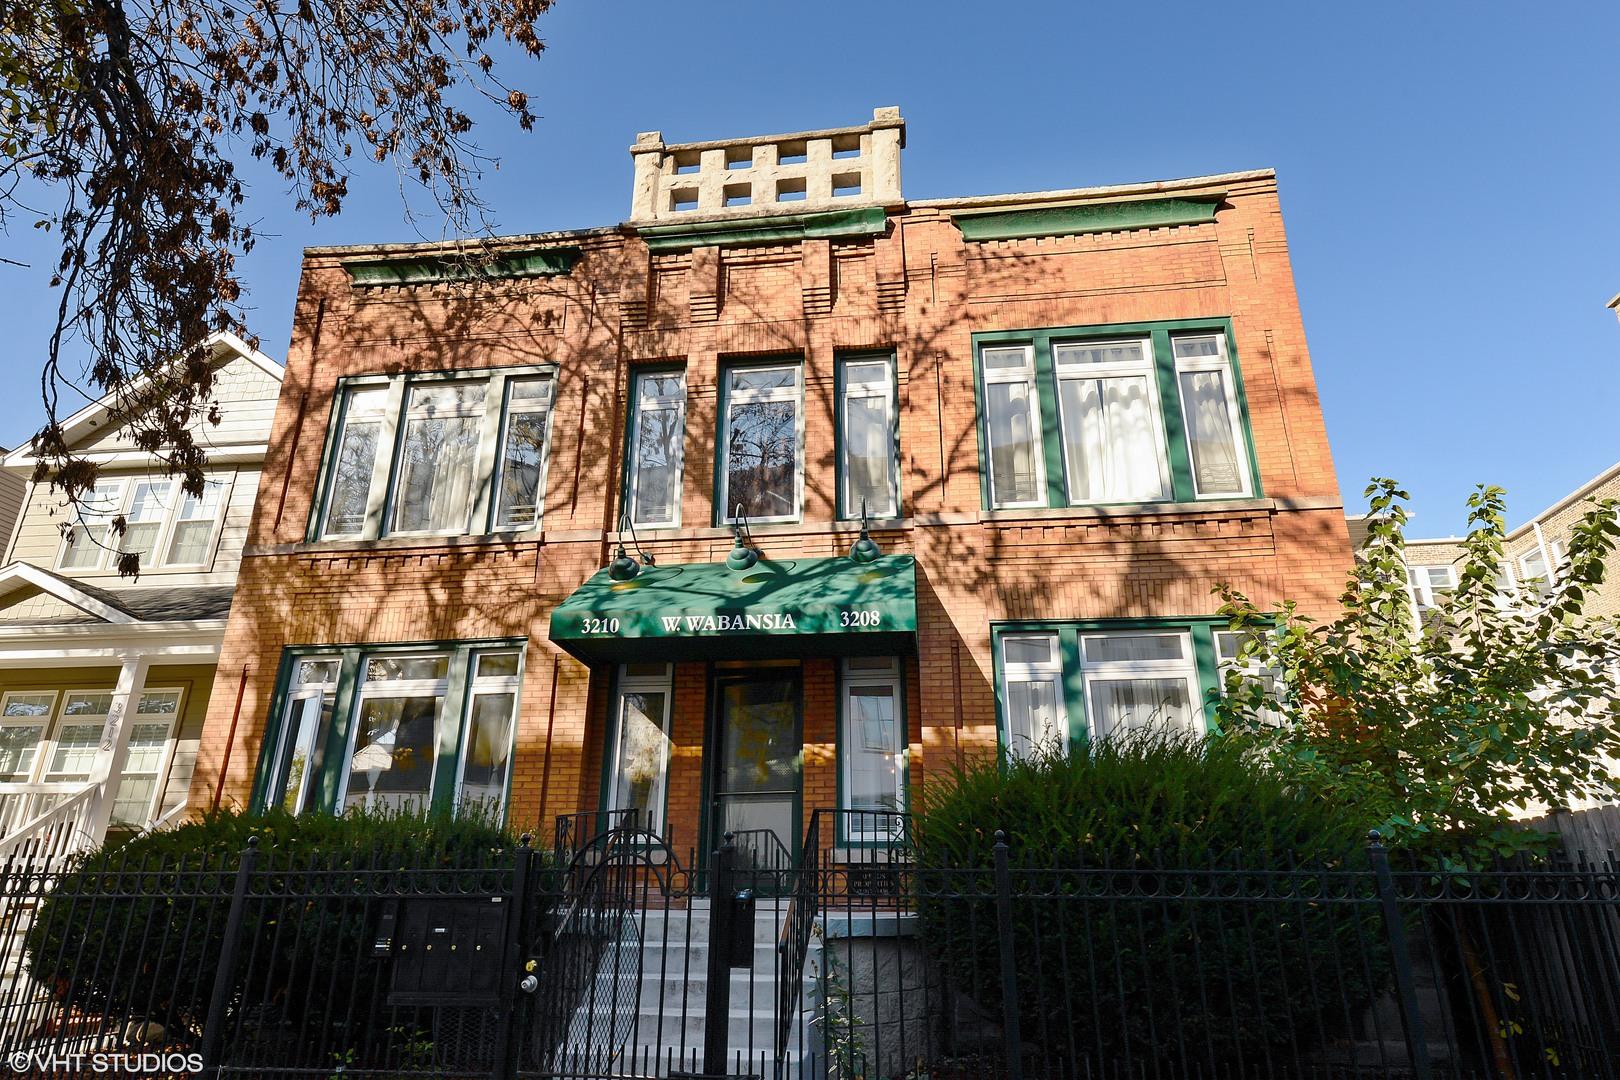 West Wabansia Ave., CHICAGO, IL 60647